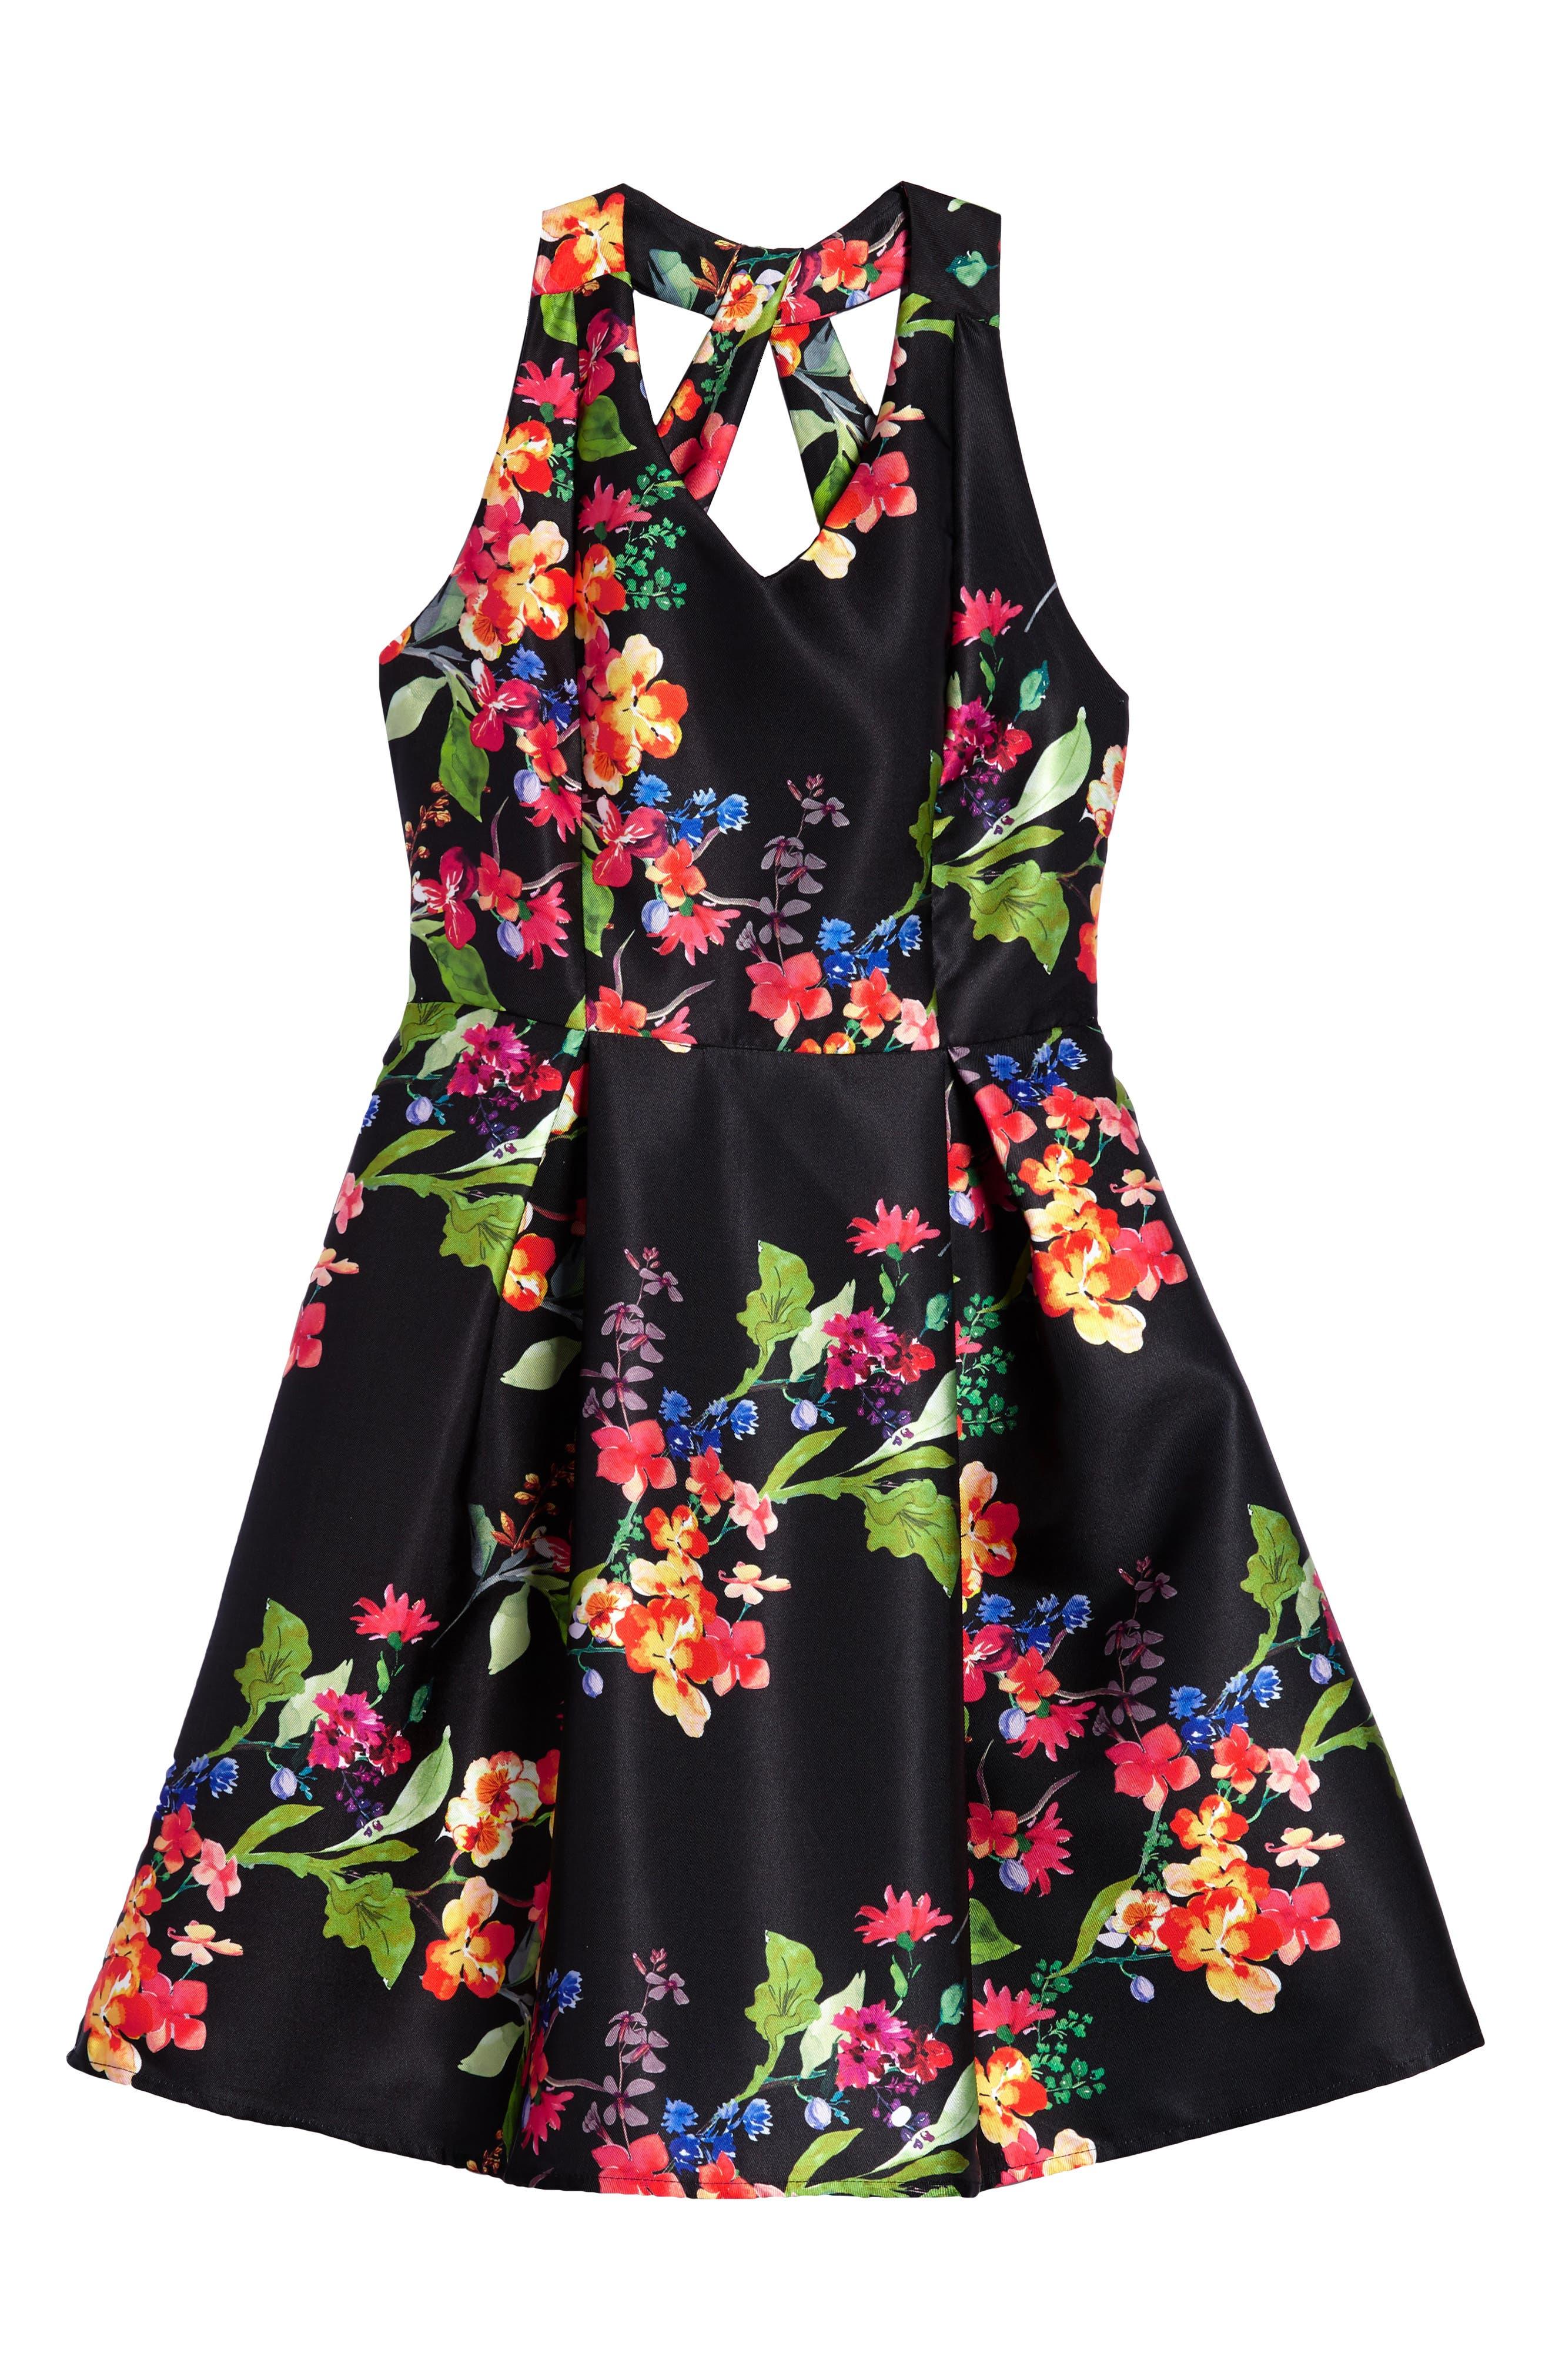 Alternate Image 1 Selected - Love, Nickie Lew Floral Print Halter Dress (Big Girls)